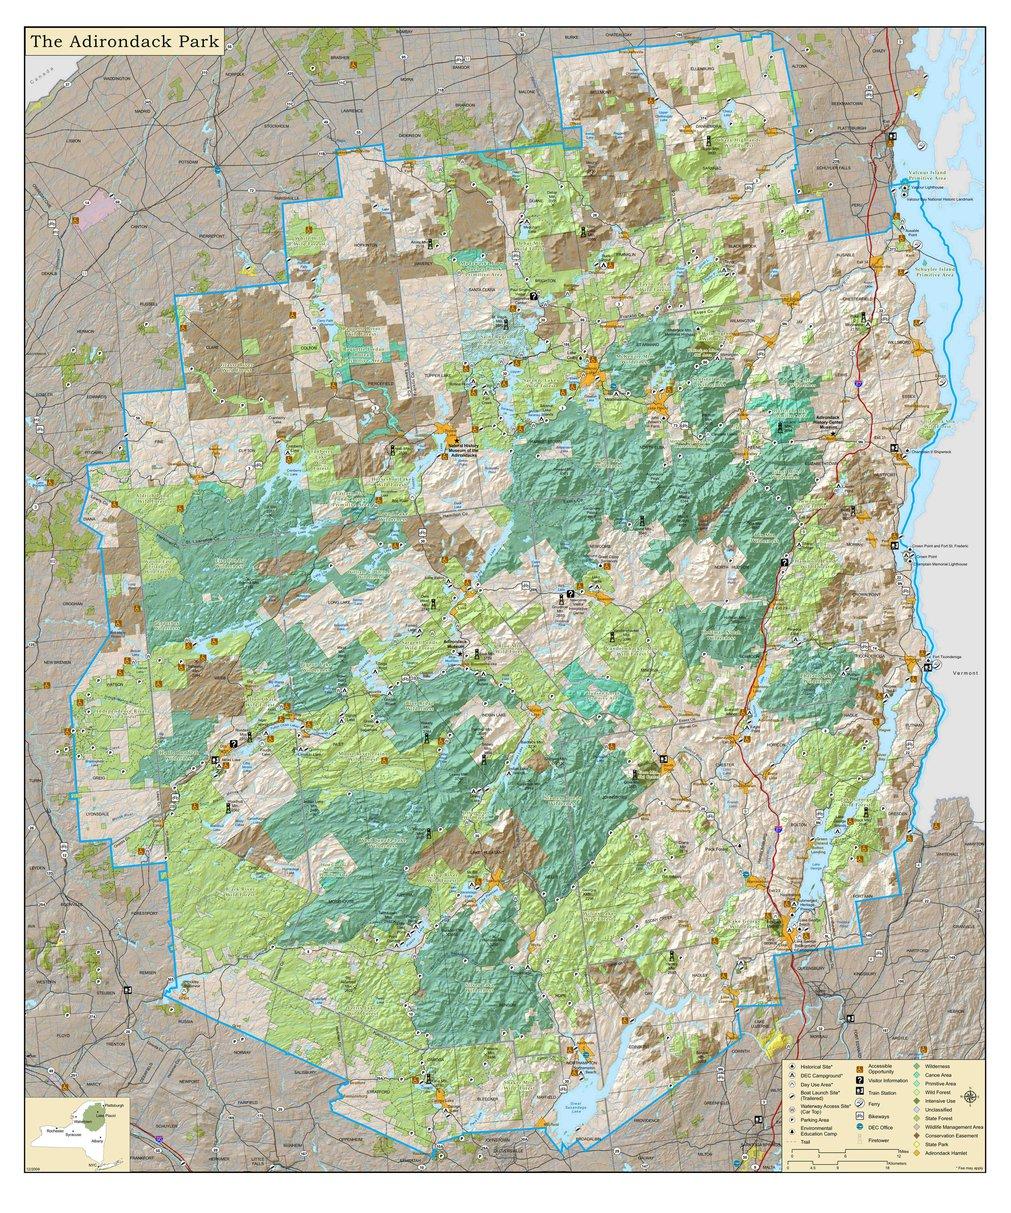 Adirondack Park Map - mapsoffline.com - Avenza Maps on new york map, pinckney chain of lakes map, great sacandaga lake map, binghamton map, ny map, boston map, watertown map, gunks map, cape cod map, philadelphia map, plattsburgh map, colorado scenic drives map, mount marcy trail map, essex chain lakes map, albany map, saranac lake map, hiking map, lake placid map, long island map, schenectady map,